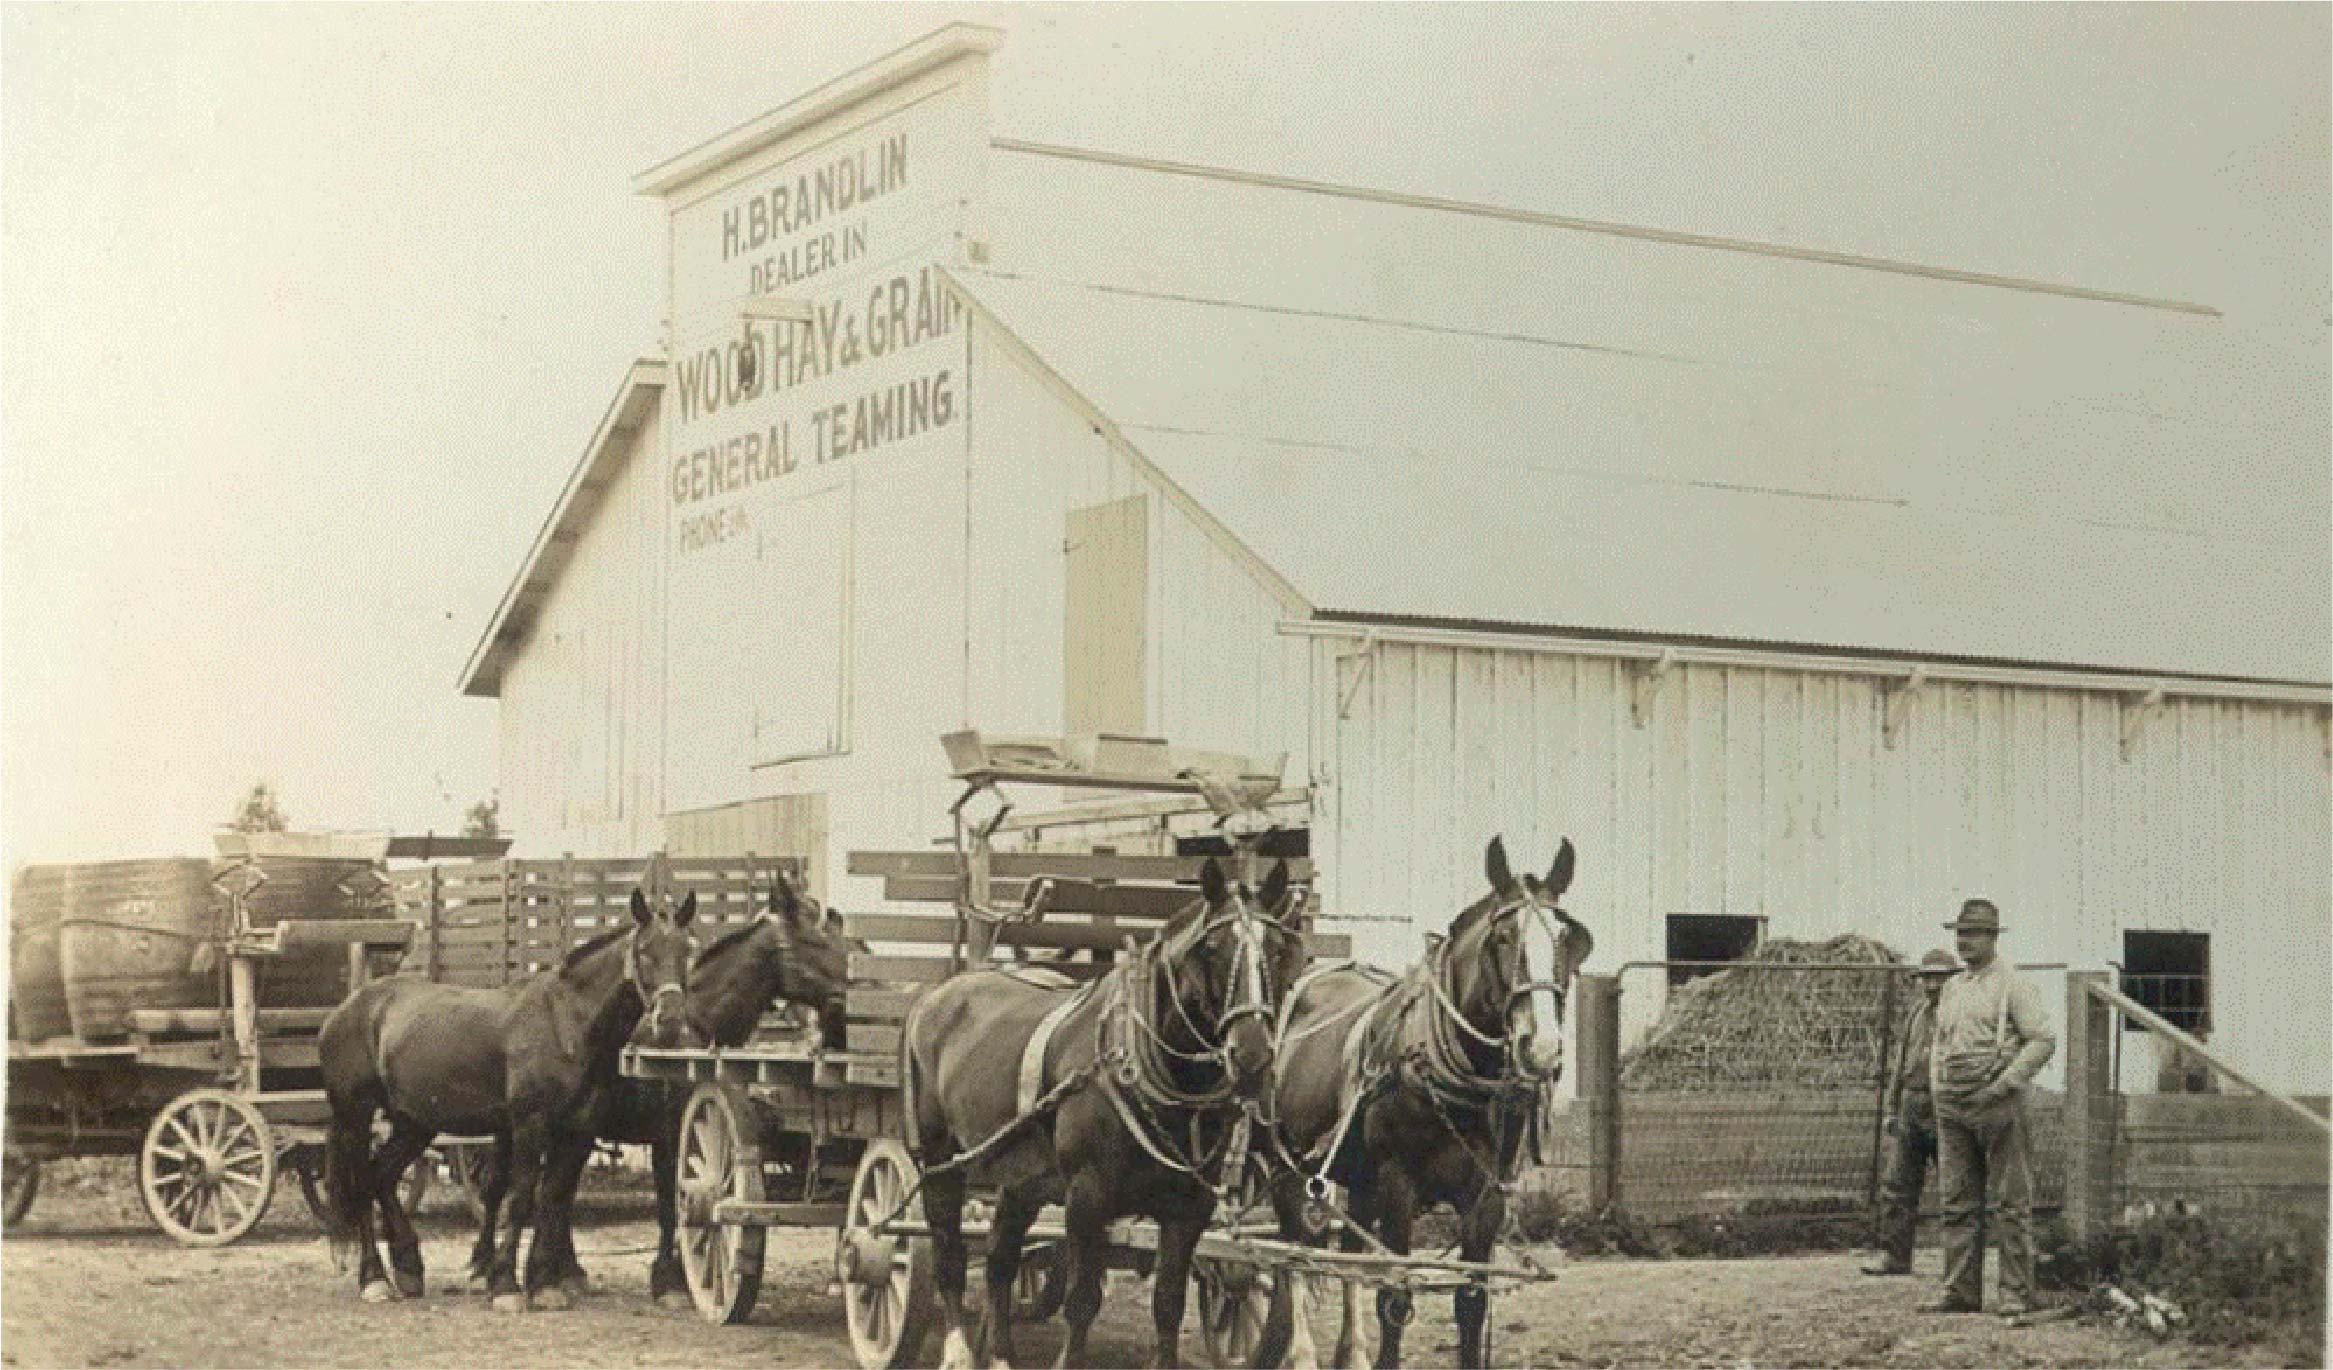 The original barn where the Brandlin family ran the local grain store and stage coach.